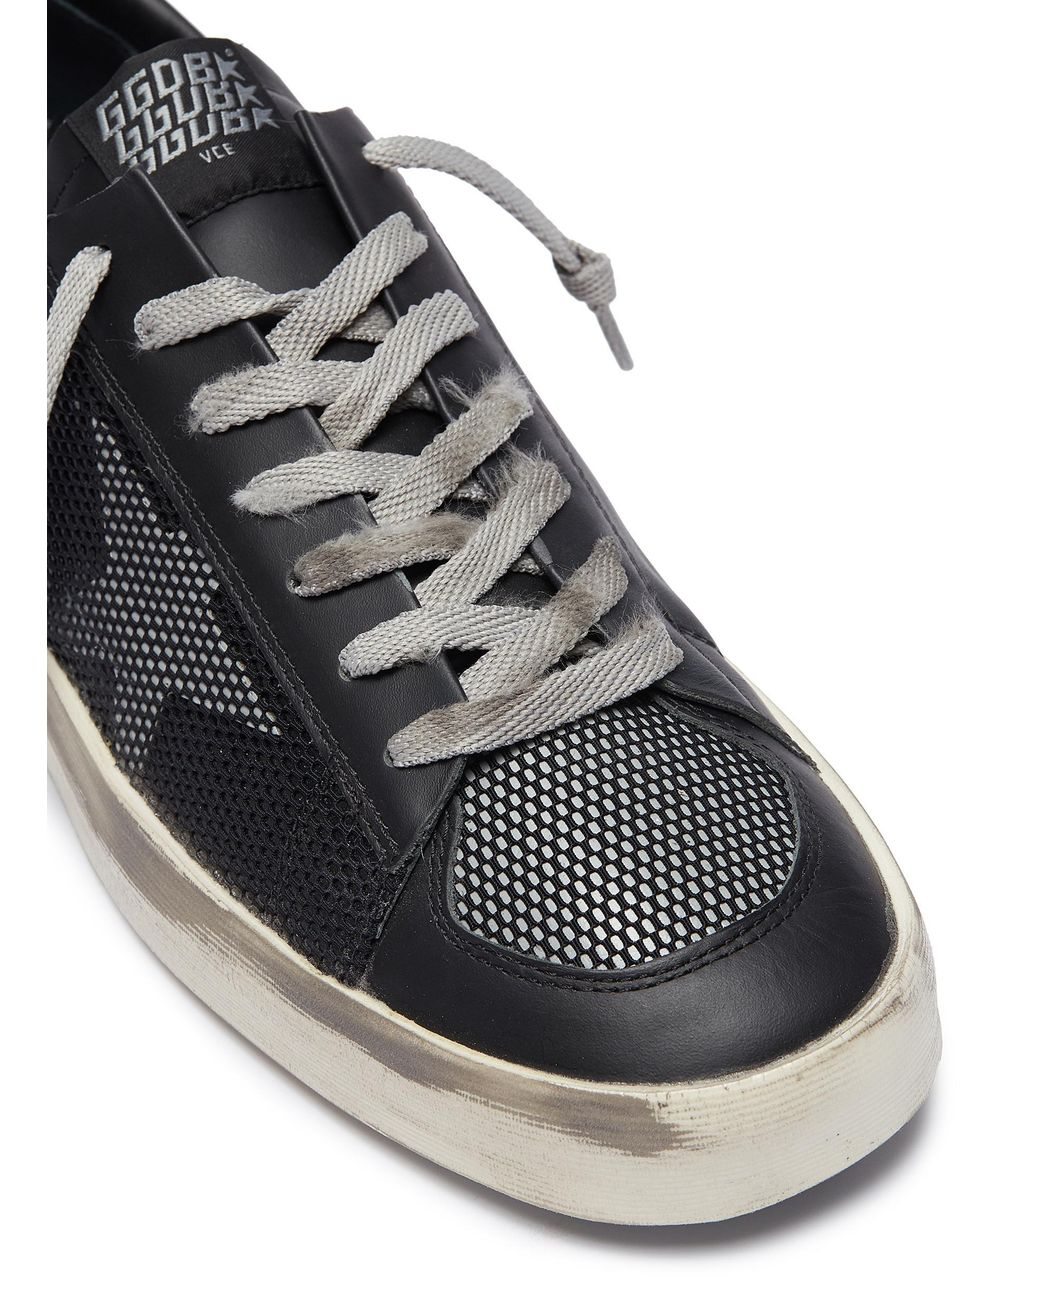 black 'stardan' mesh panel leather trainers